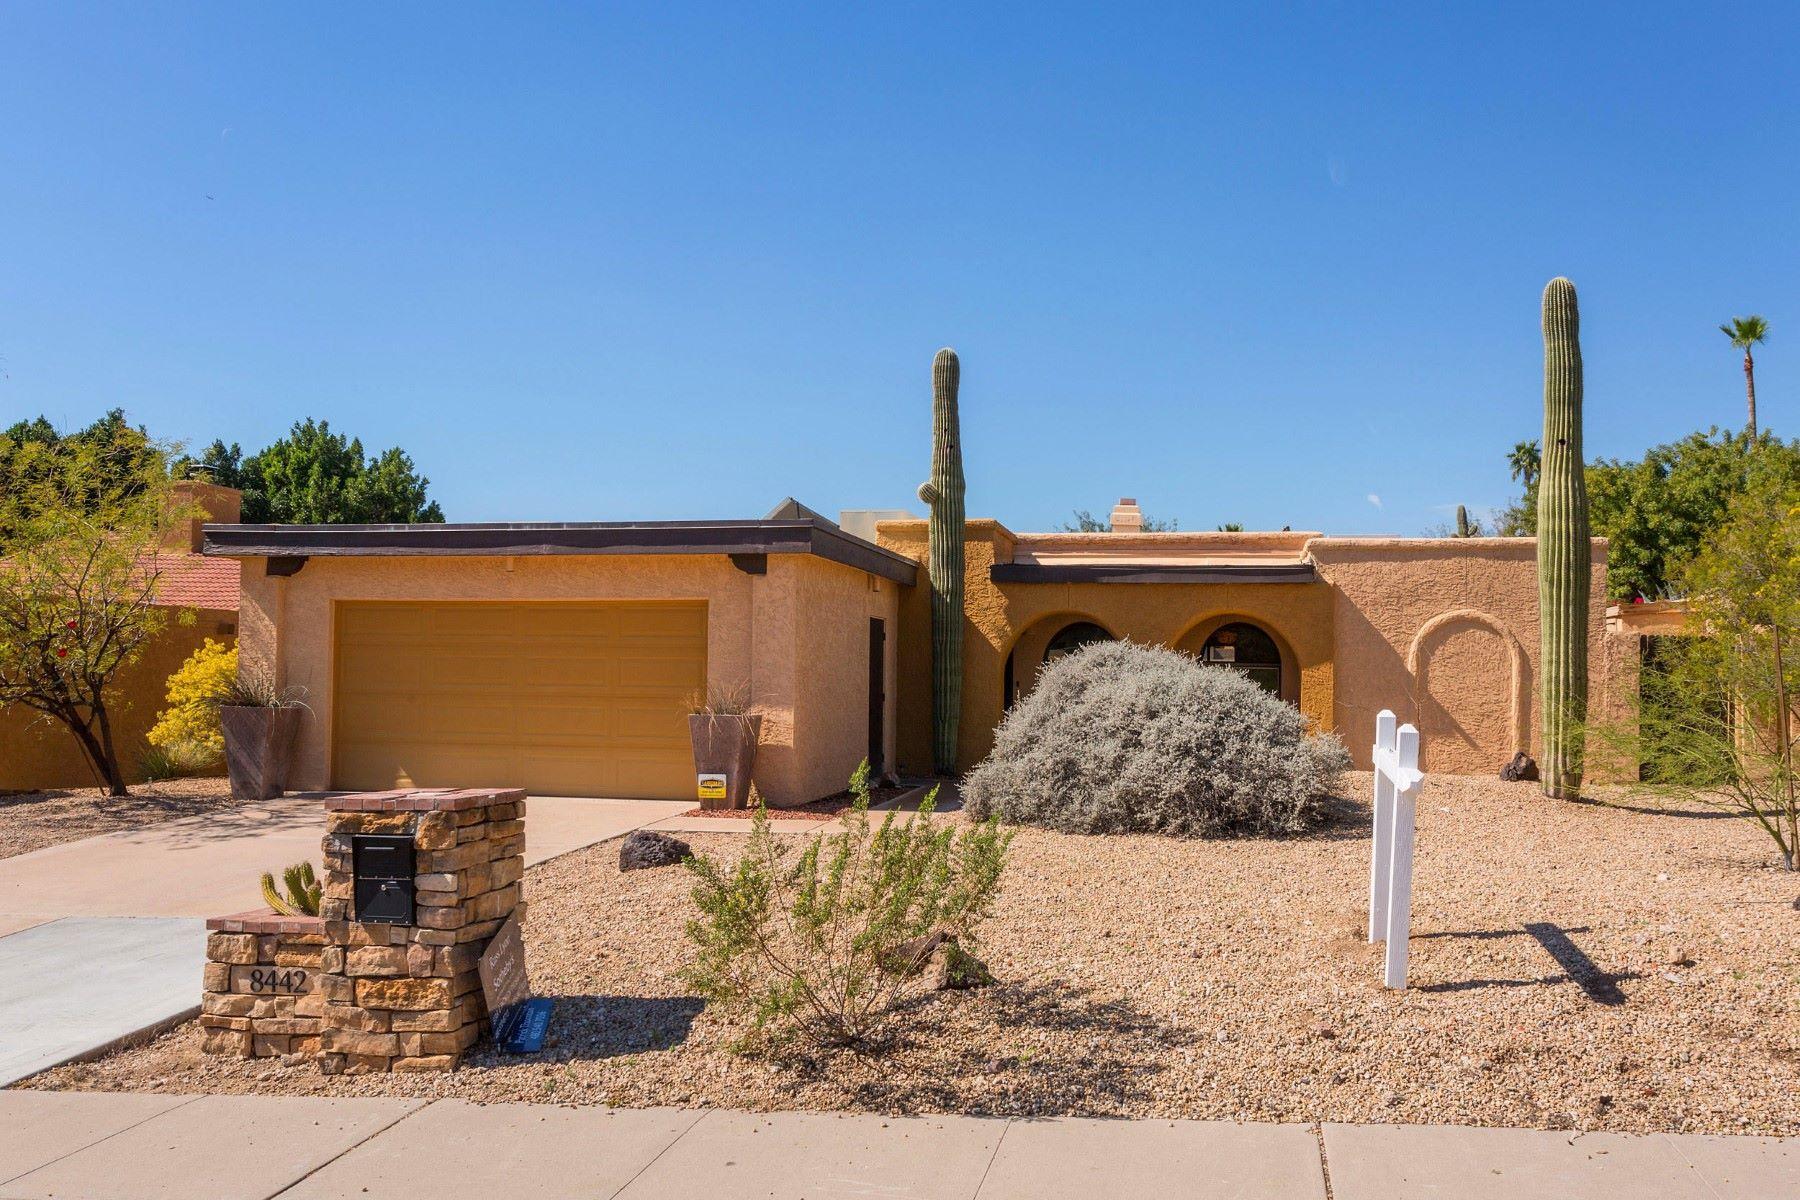 Moradia para Venda às Lovely three bedroom Phoenix home 8442 N 18th St Phoenix, Arizona, 85020 Estados Unidos